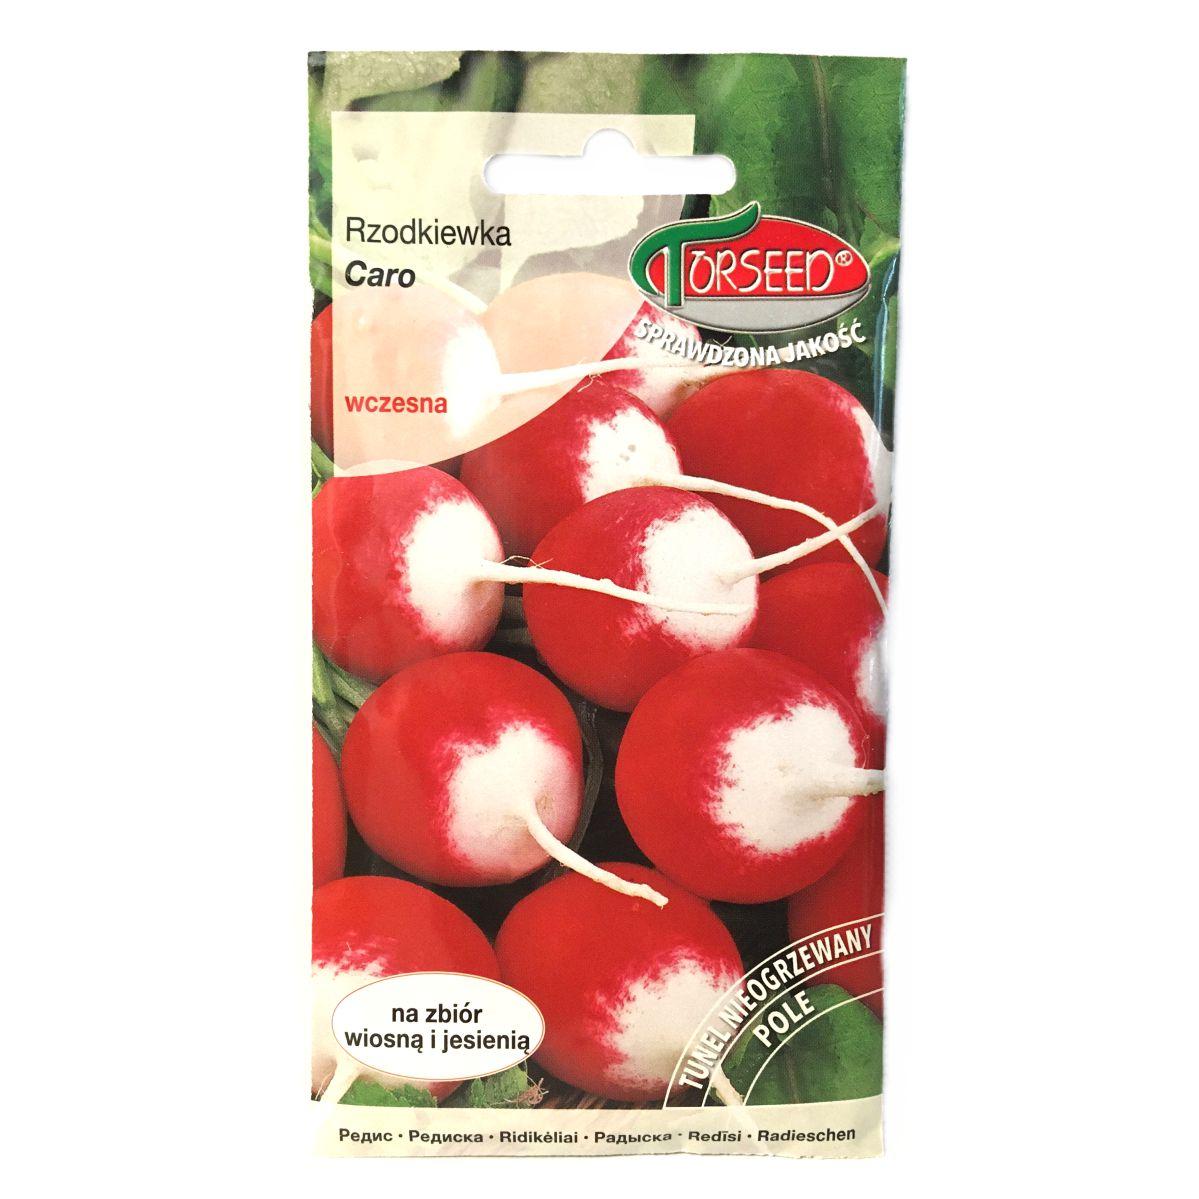 Rzodkiewka Caro nasiona Torseed